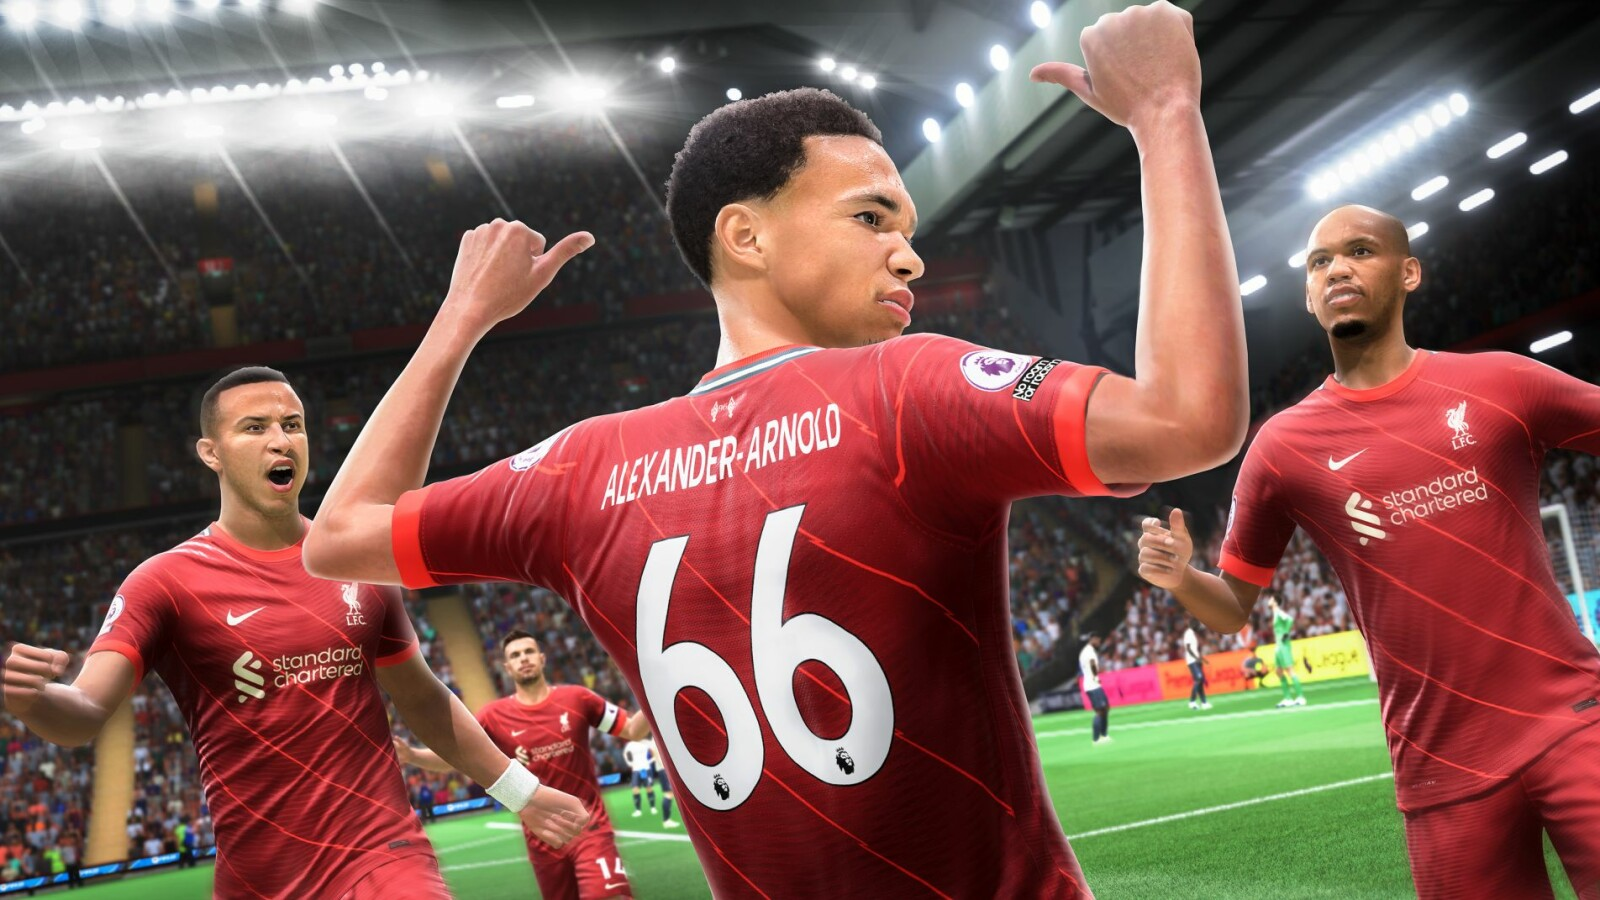 FIFA 22: EA enthüllt Gameplay, Hypermotion und KI im Video